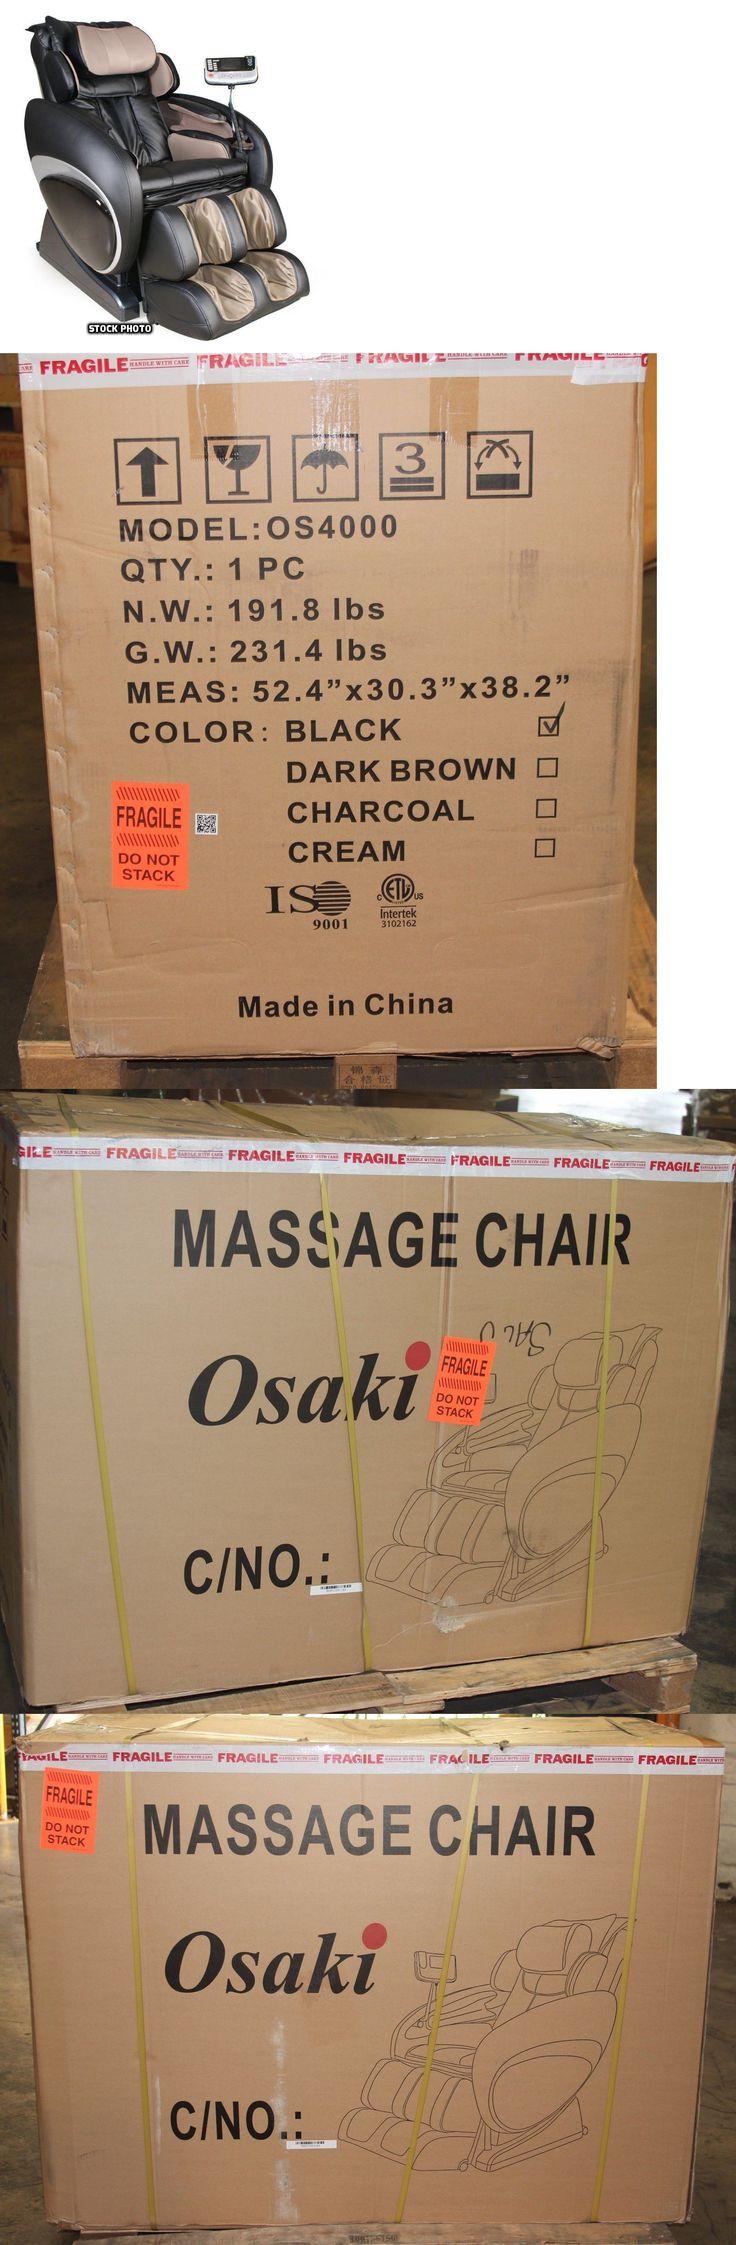 electric massage chairs osaki os deluxe zero gravity massage chair black u003e - Osaki Os4000